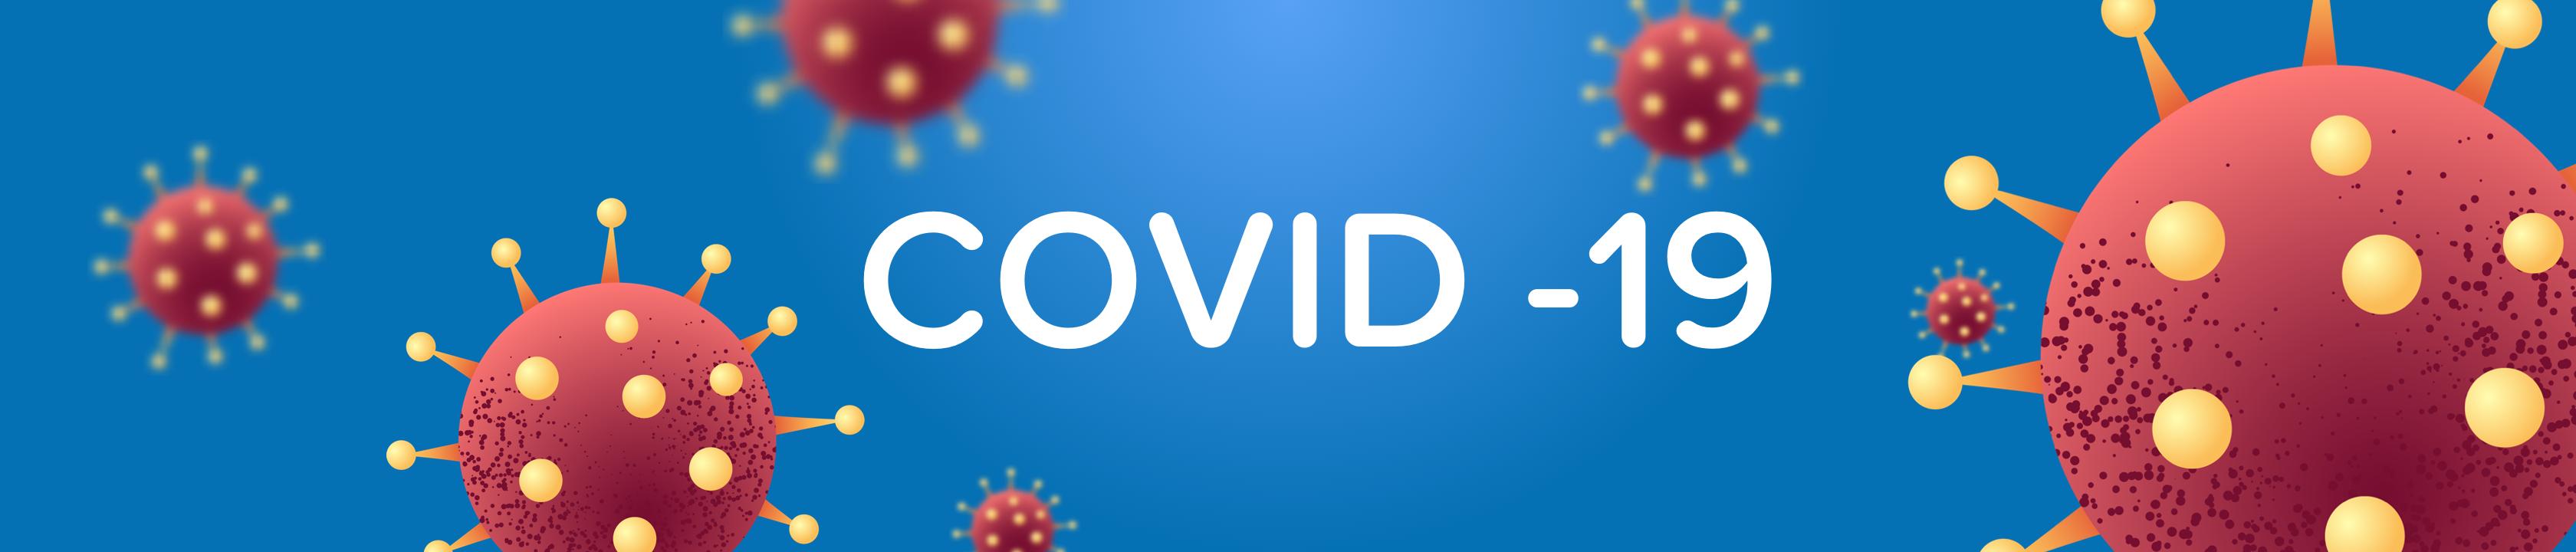 The COVID-19 Community